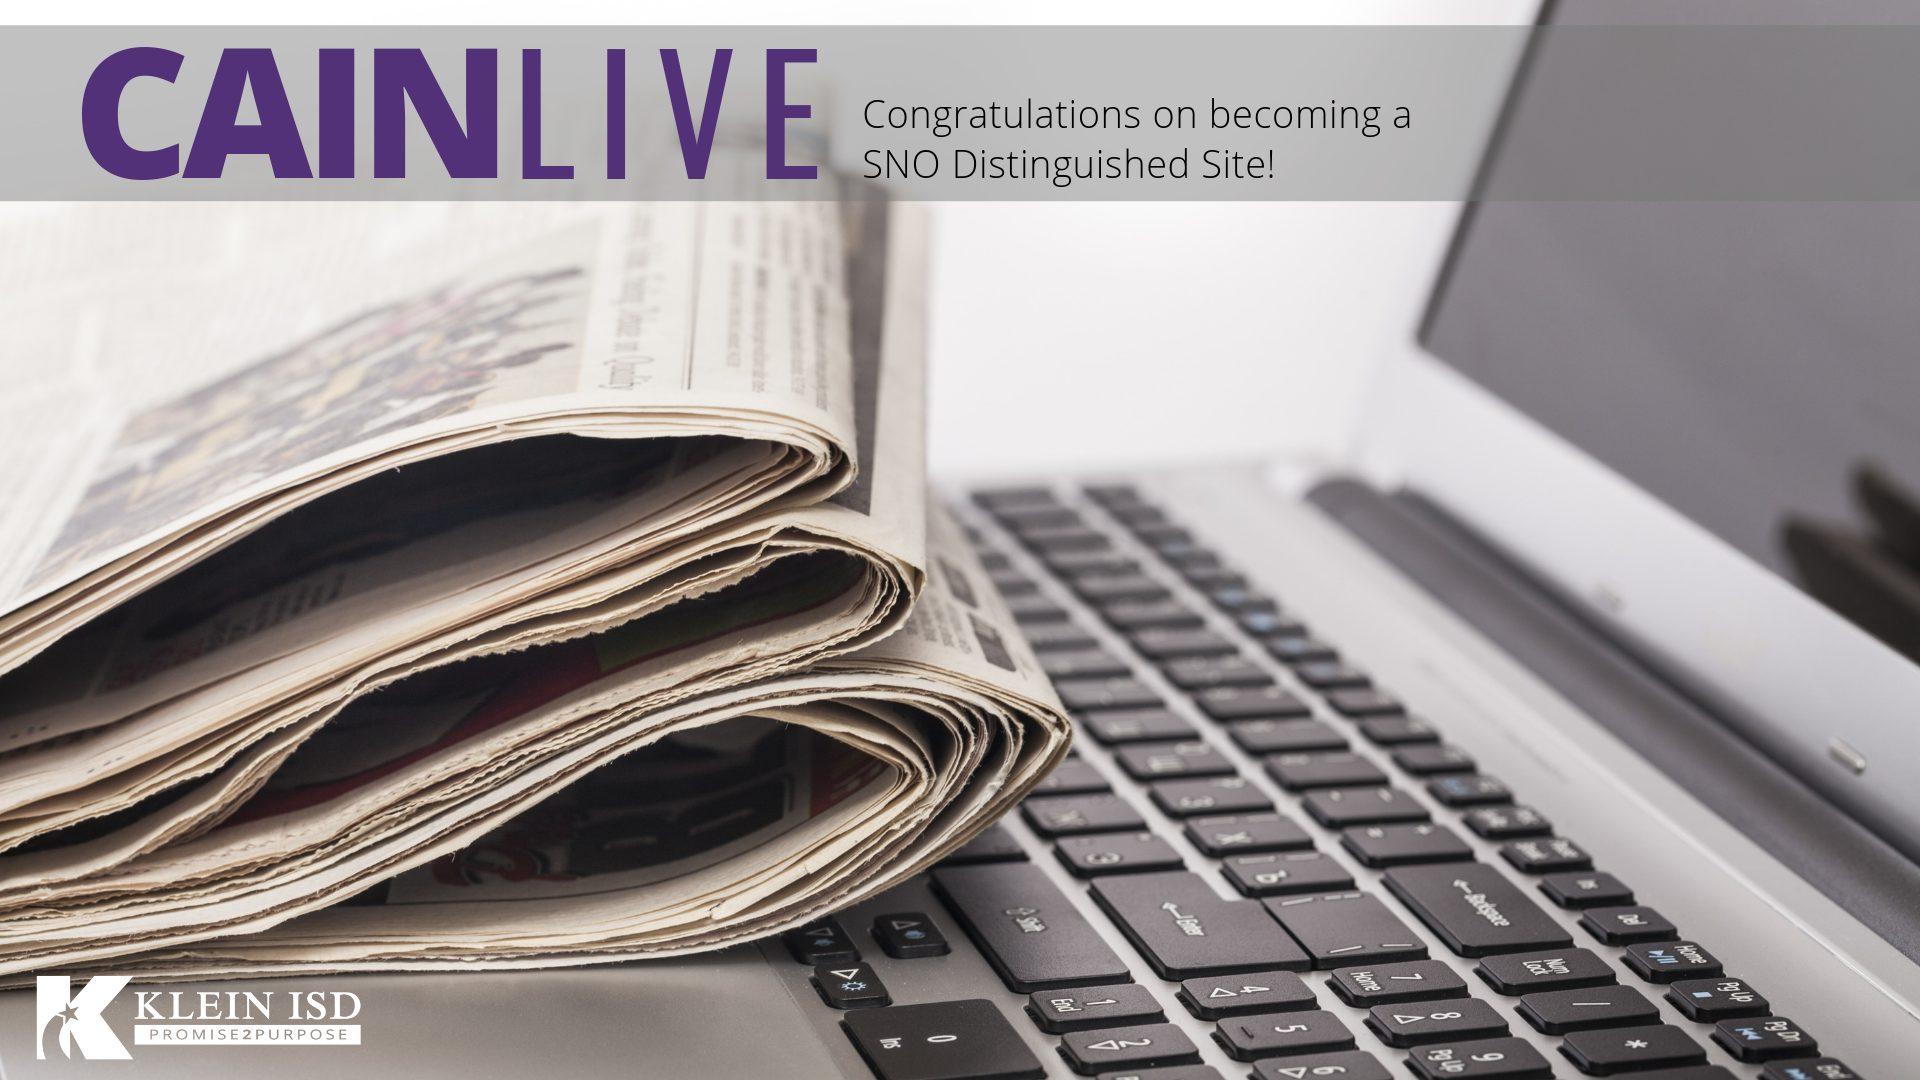 Klein Cain Newspaper Wins National Distinction